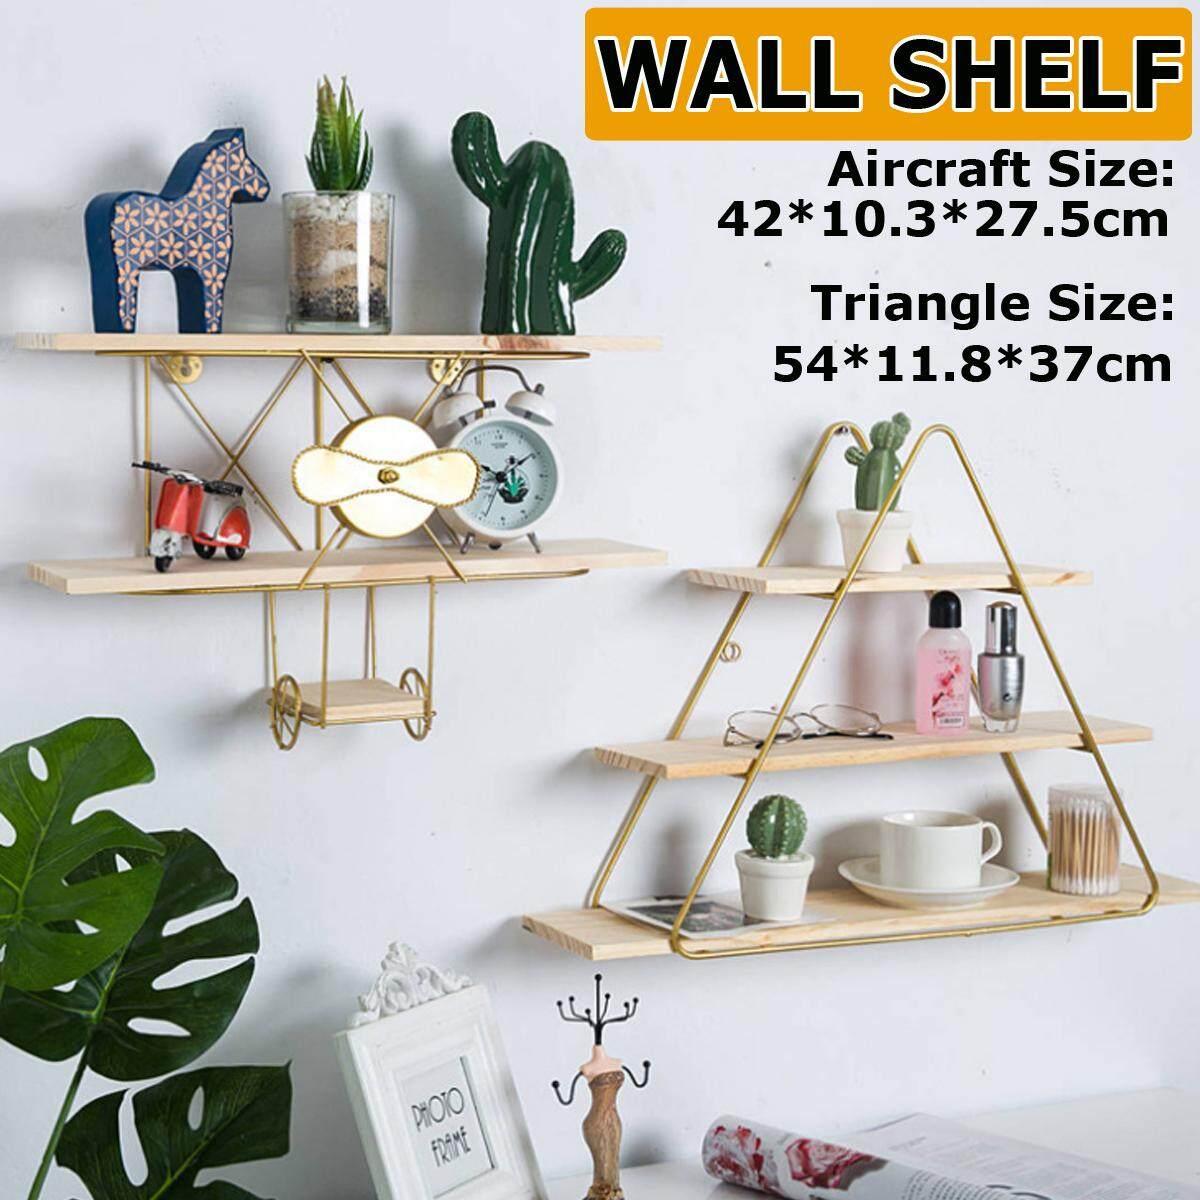 【Free Shipping + Flash Deal】Iron+Wood Floating Wall Hanging Shelve Storage Shelf Rack Bookcase Display Decor